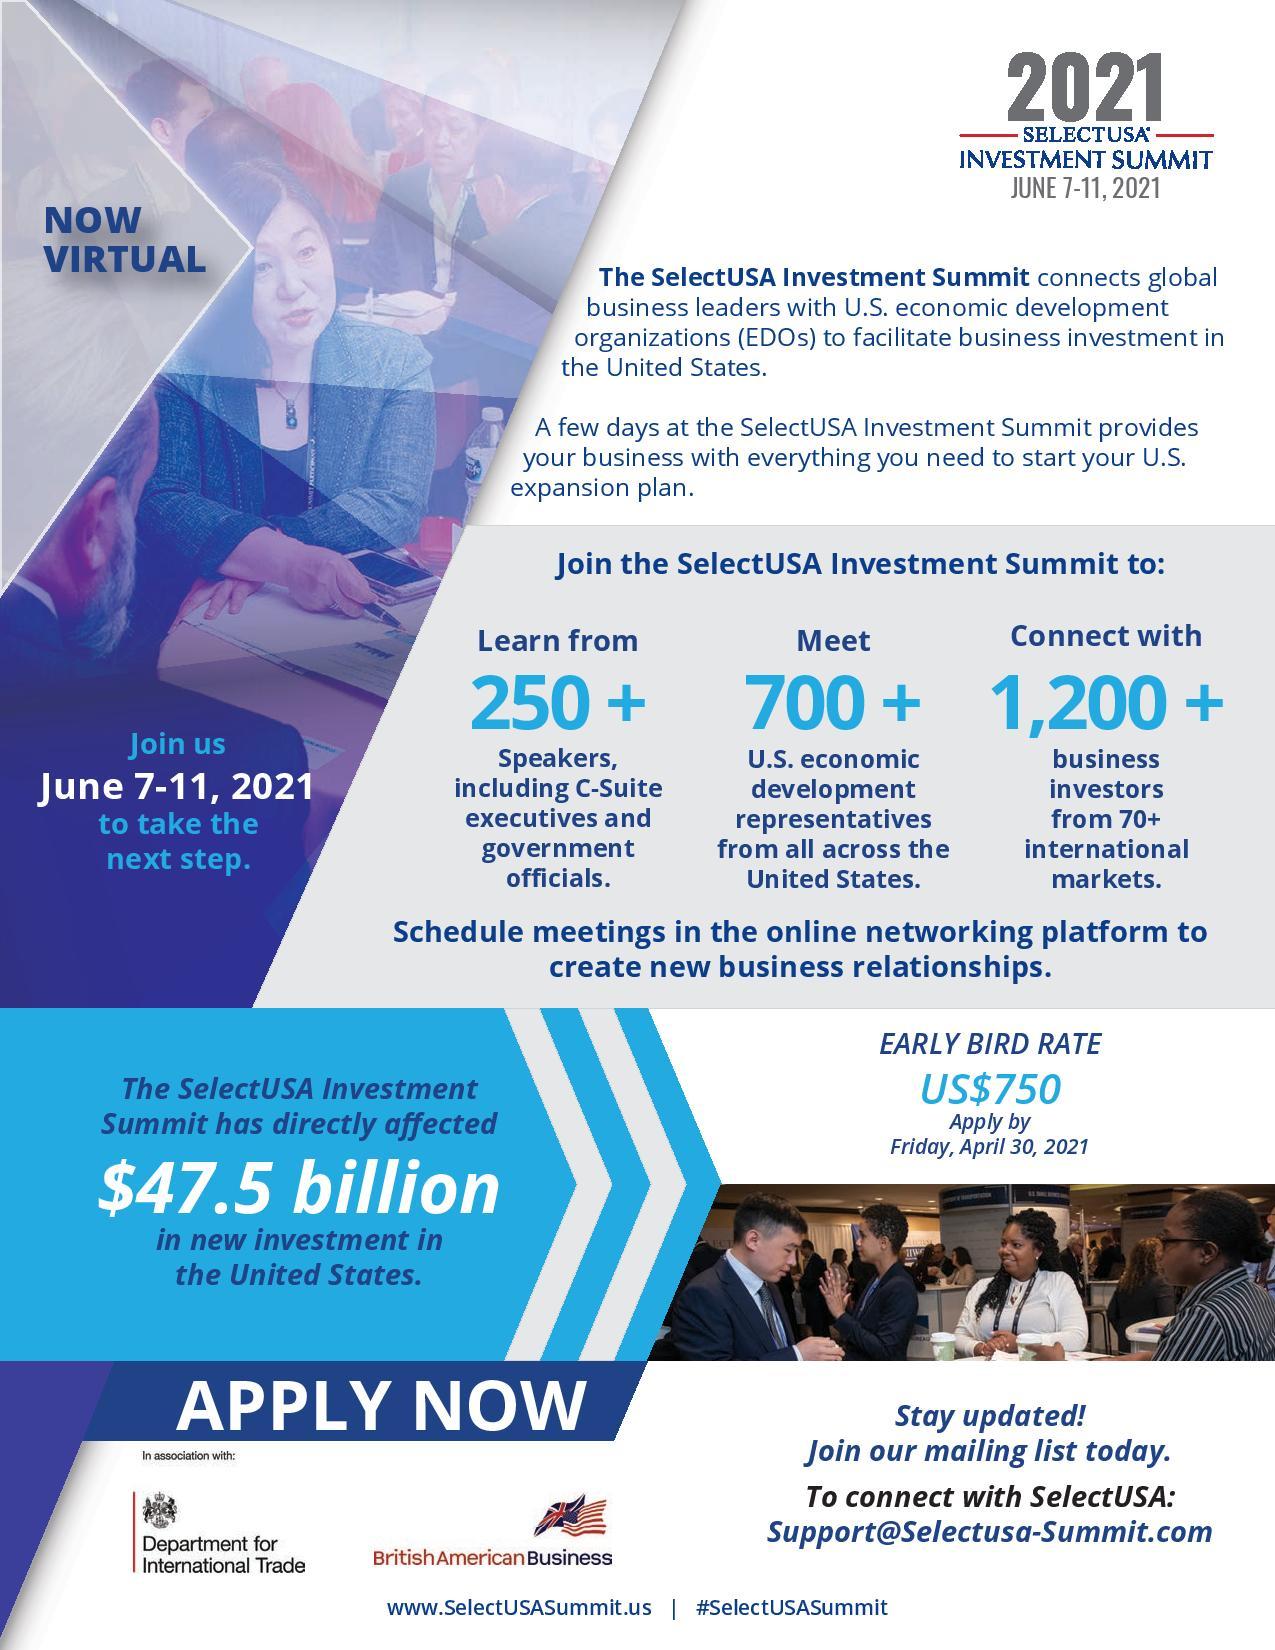 2021 SelectUSA Investment Summit Flyer